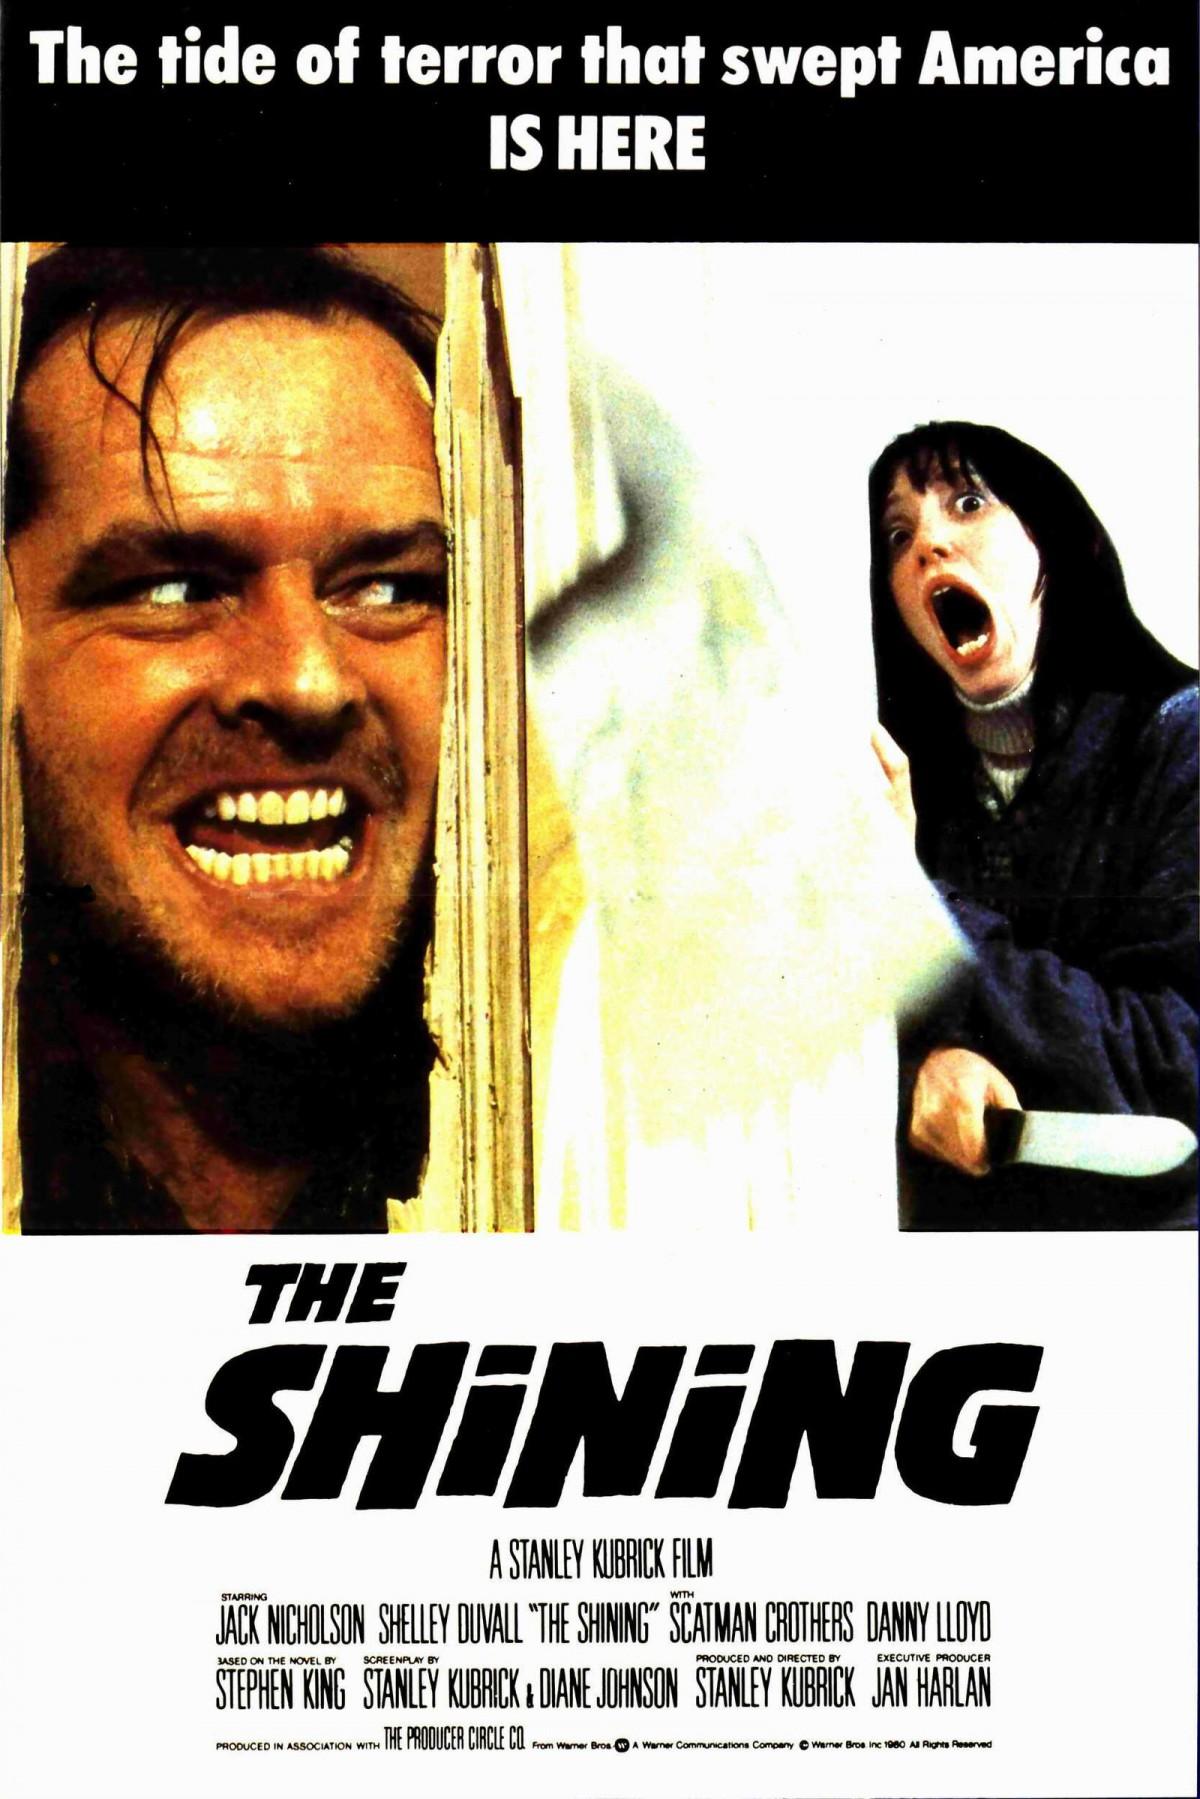 39. The Shining (1980)